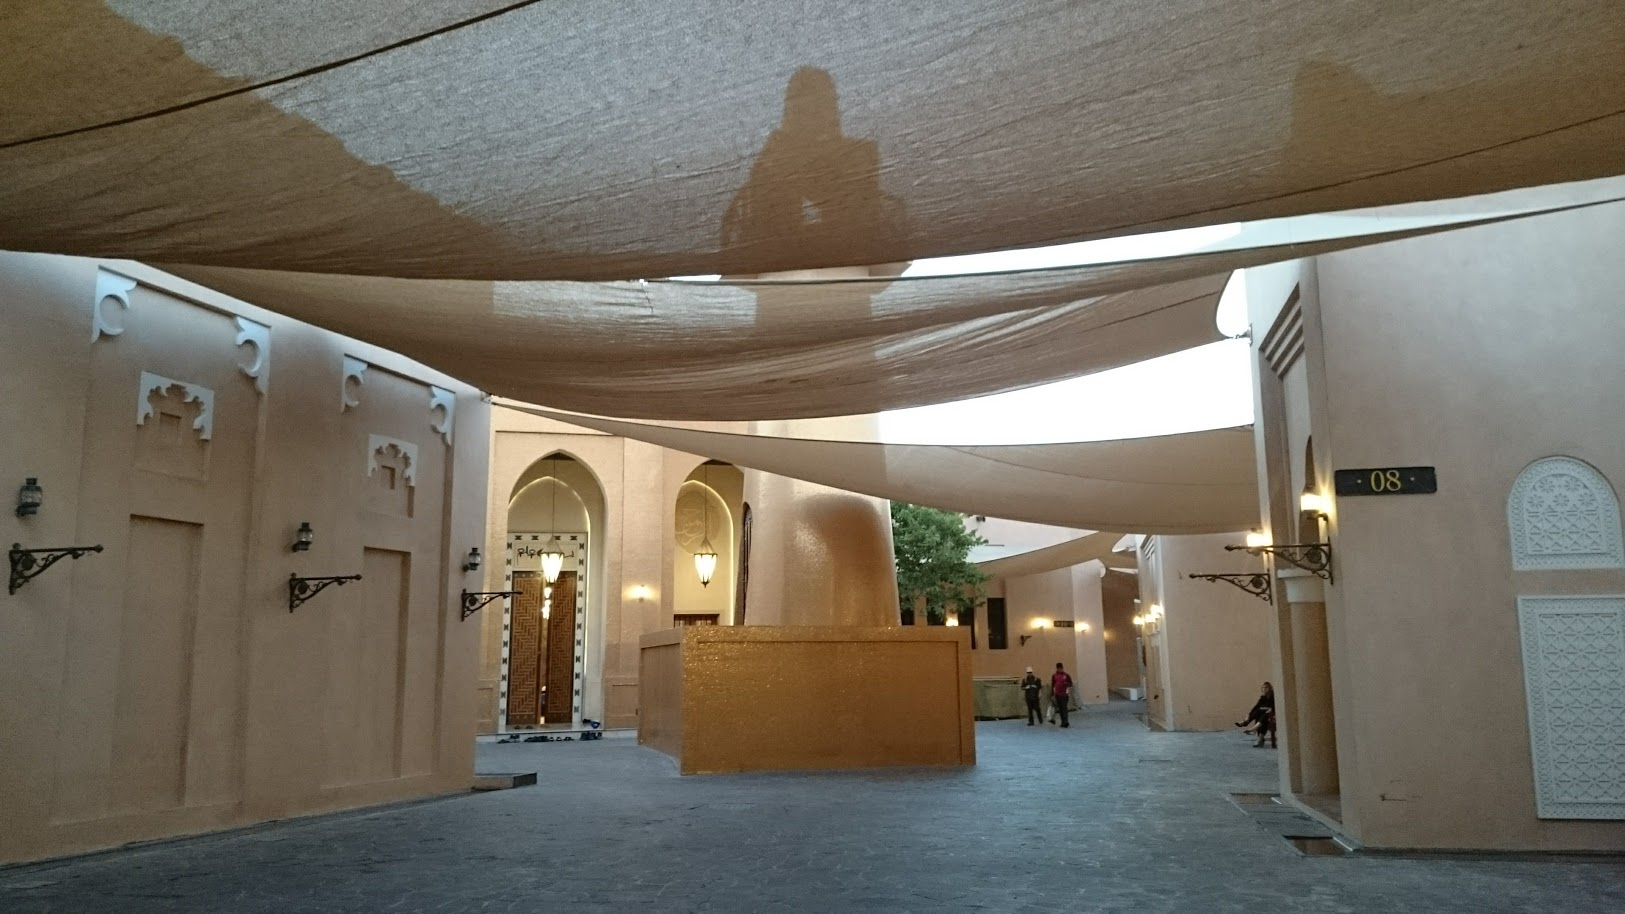 Katara Cutural village doha qatar välilasku